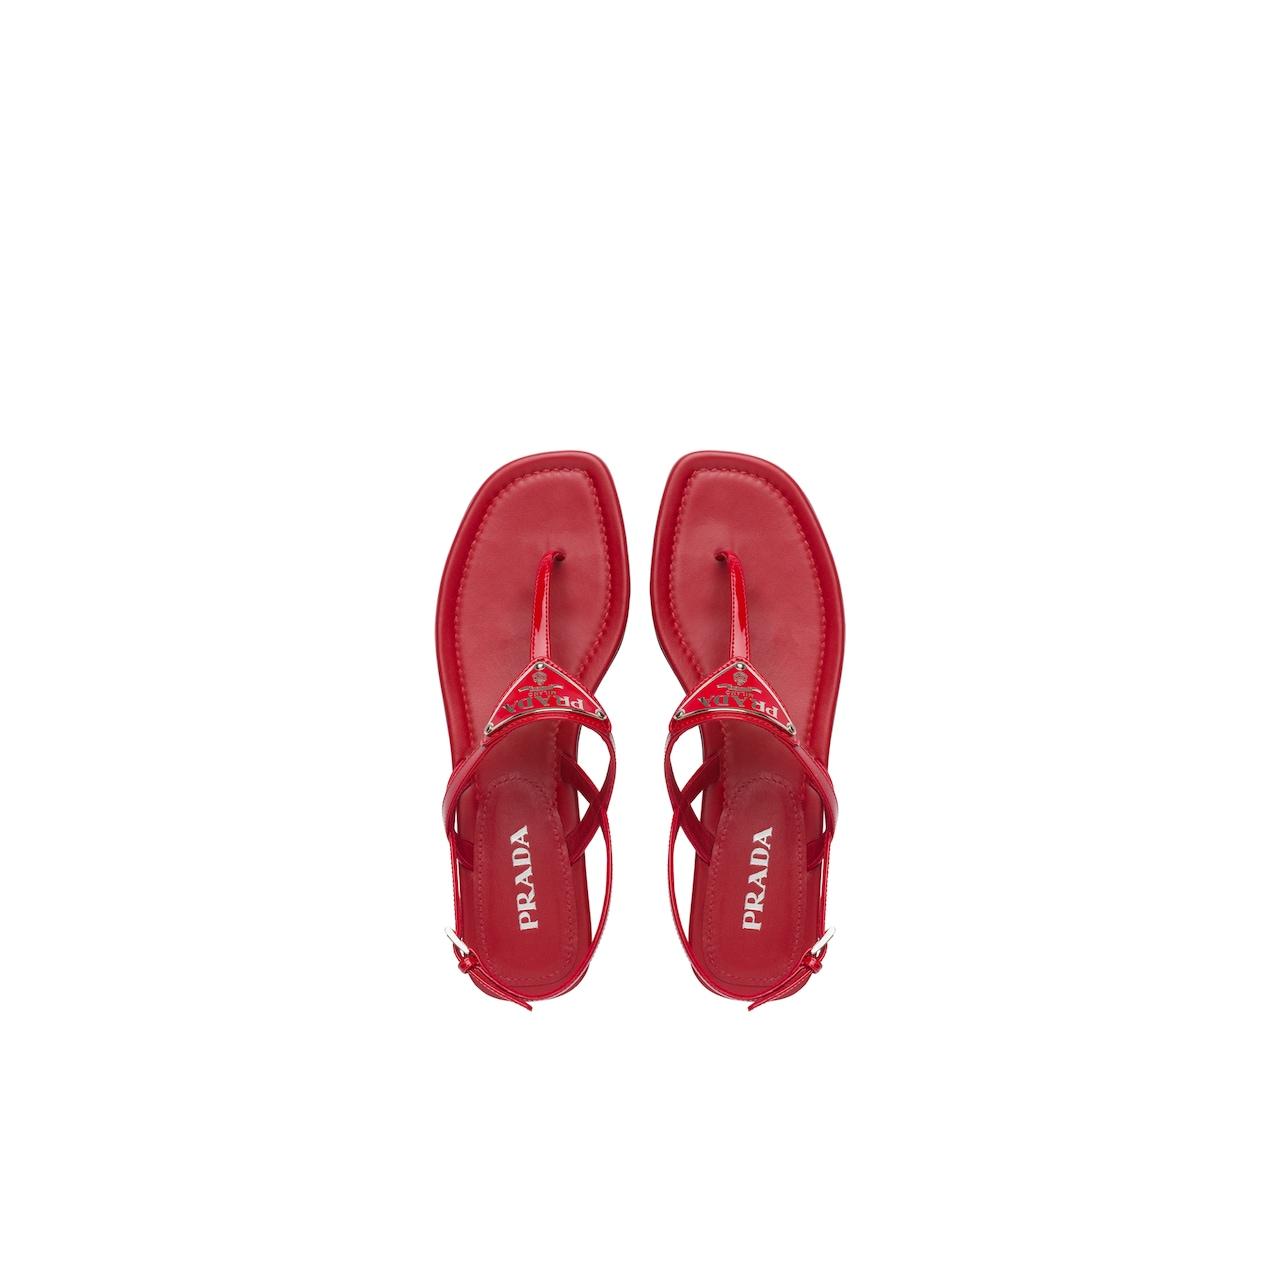 Prada Patent leather thong sandals 2